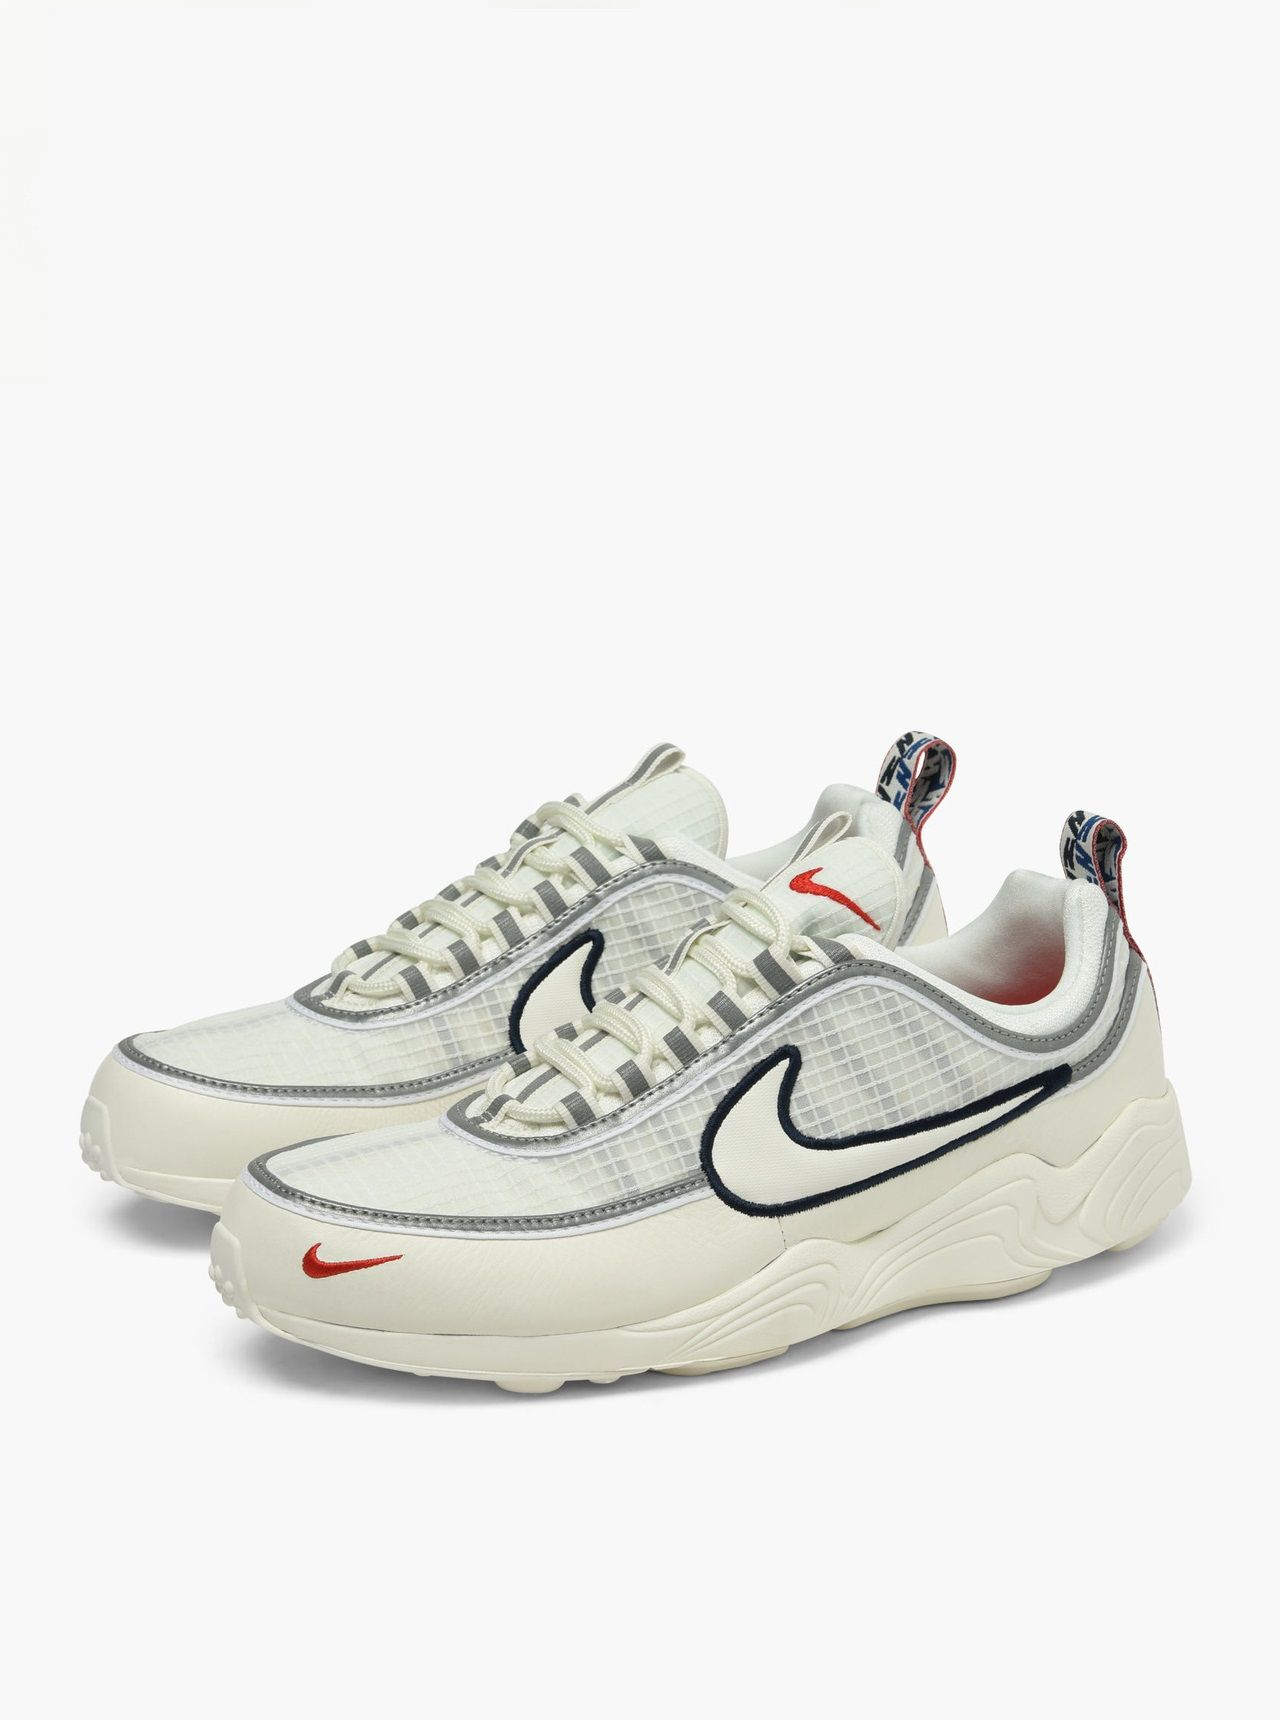 851efe50f Nike Air Zoom Spiridon SE 'USA Tape' | Sneakers: Nike Air Spiridon ...